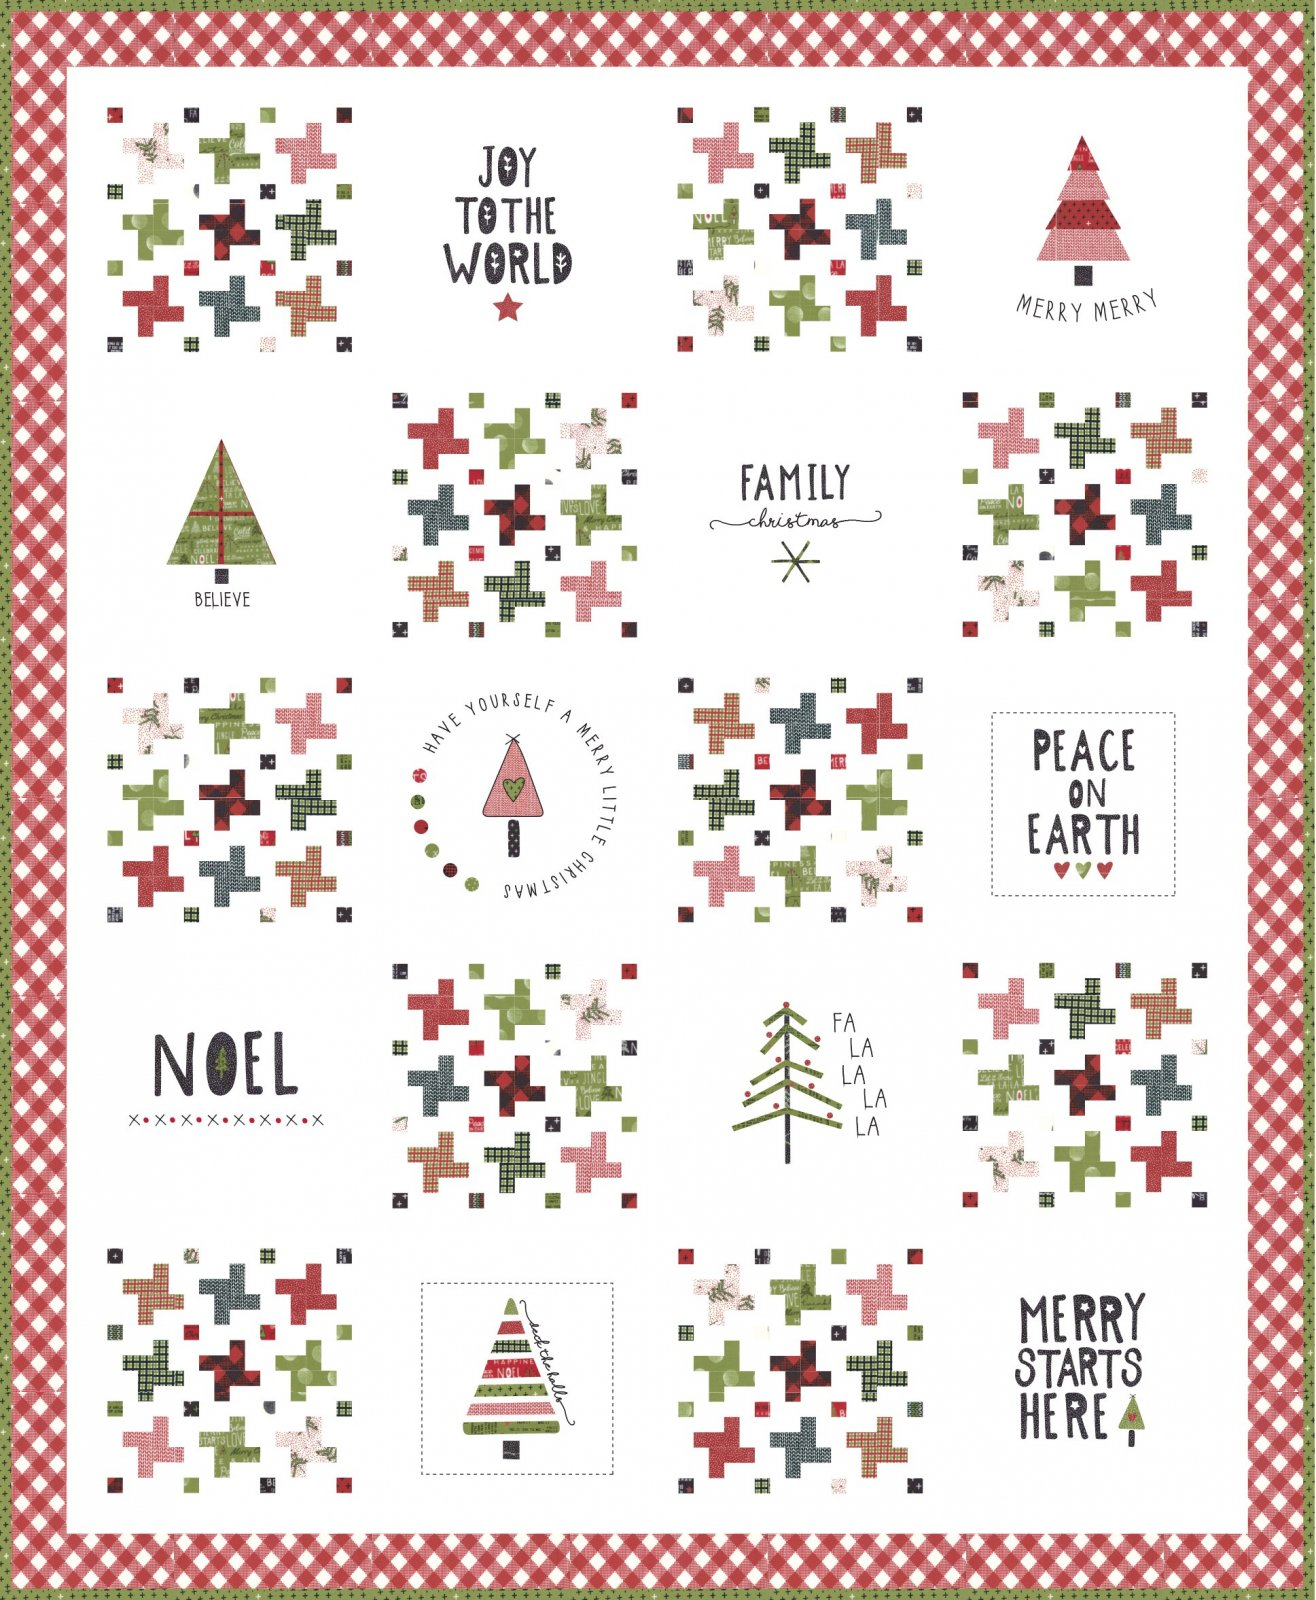 Merry Starts Here -kit